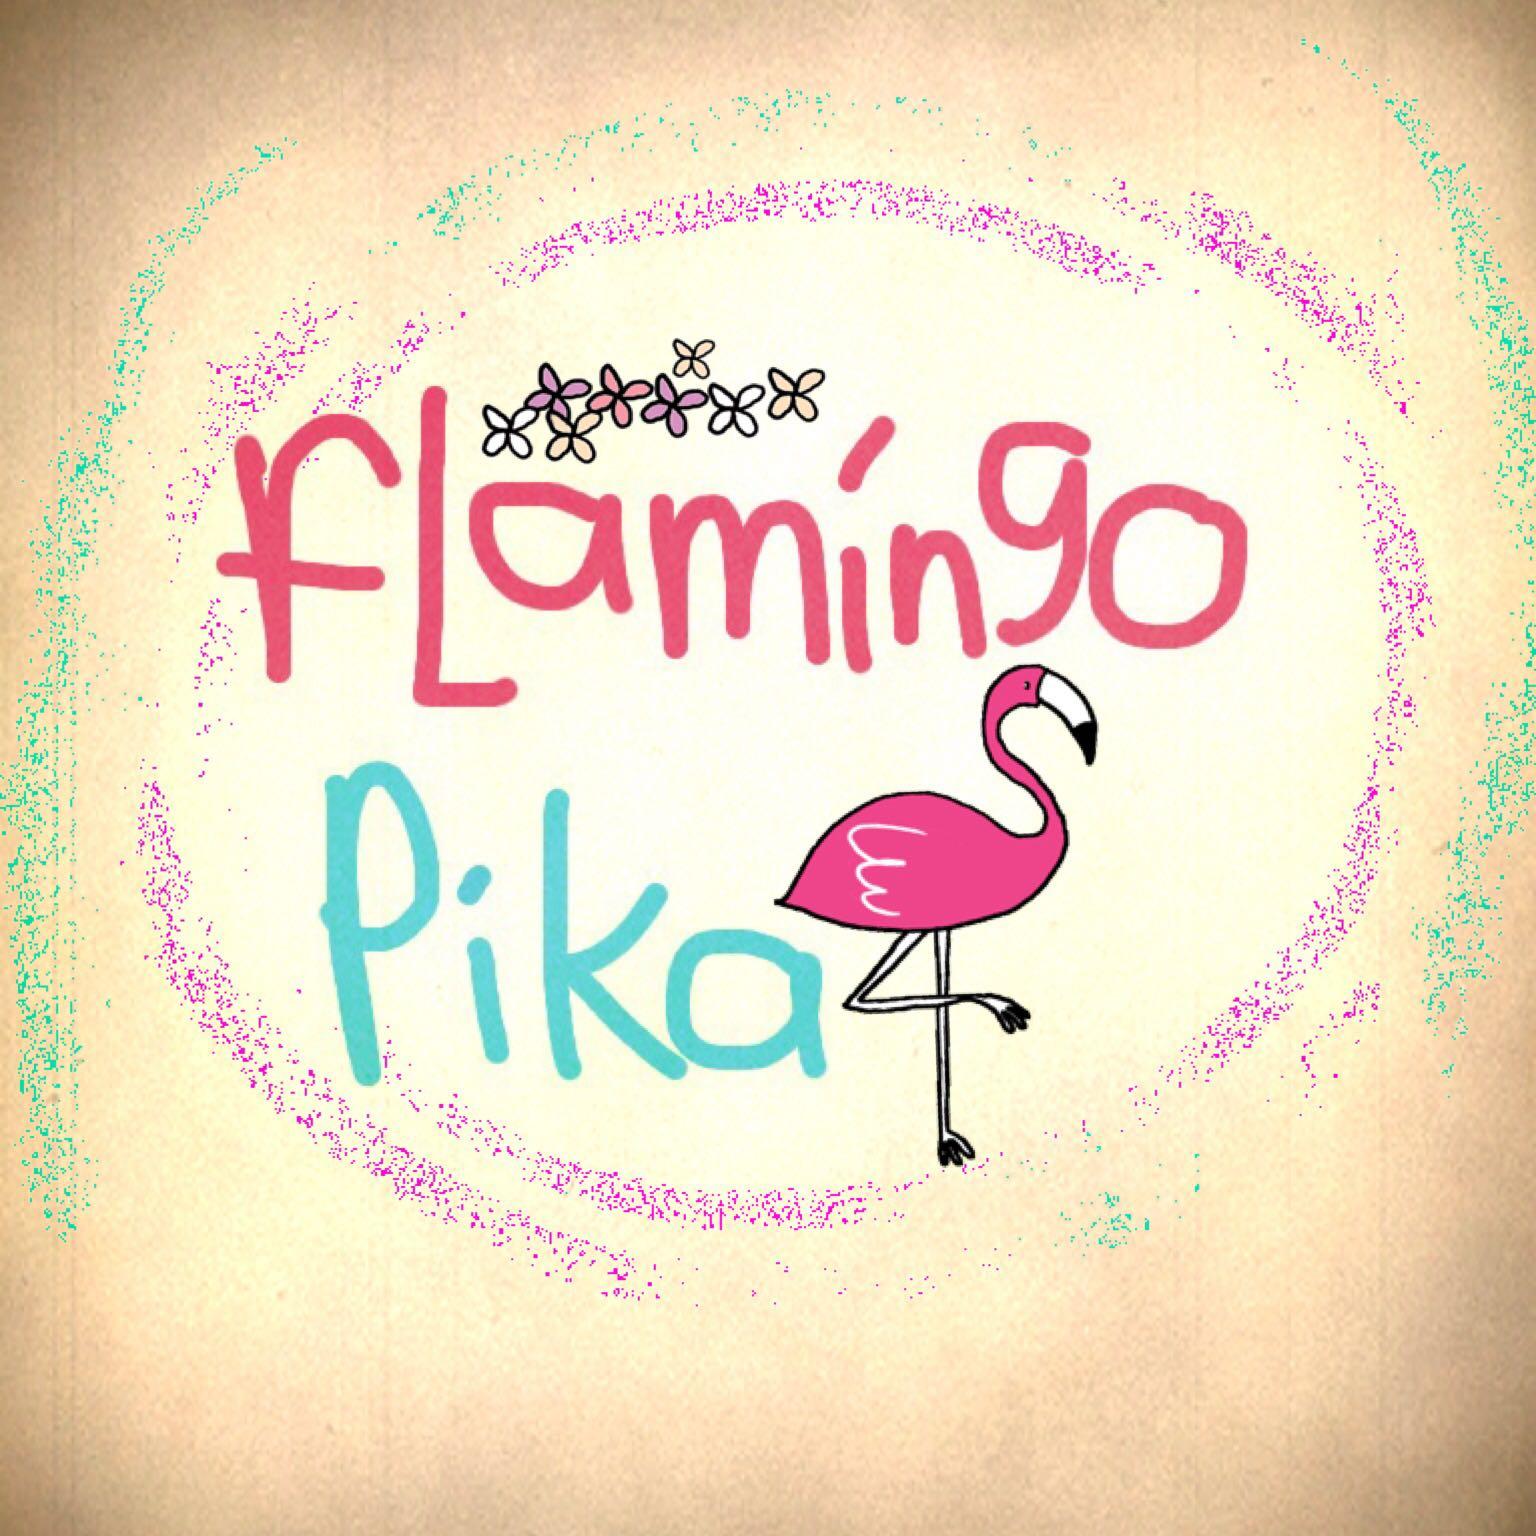 flamingopika